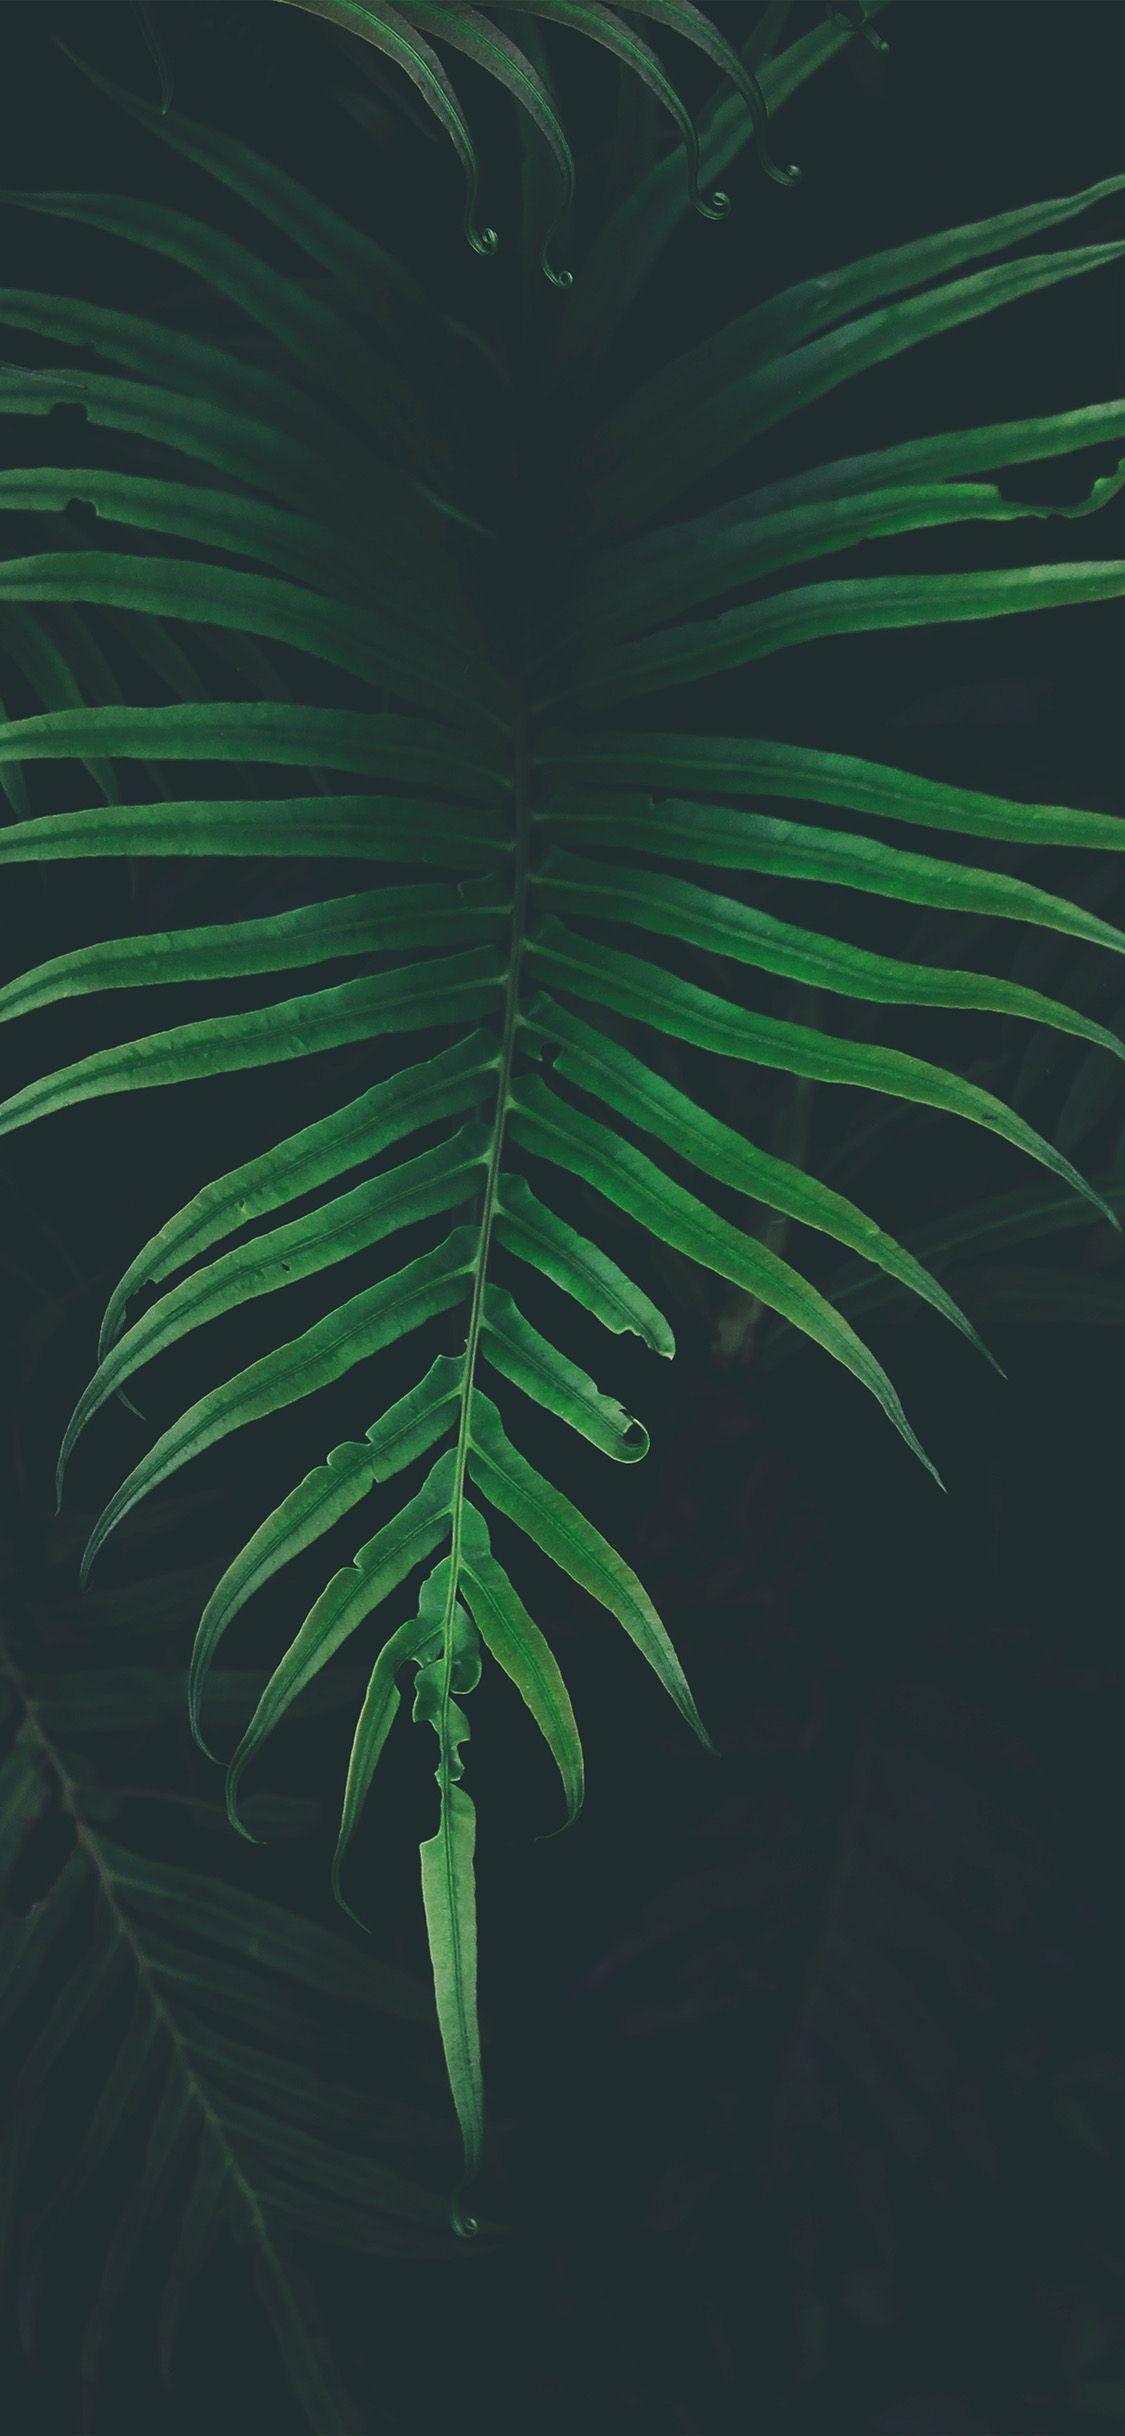 nw44 leaf tree dark nature via Wallpapers